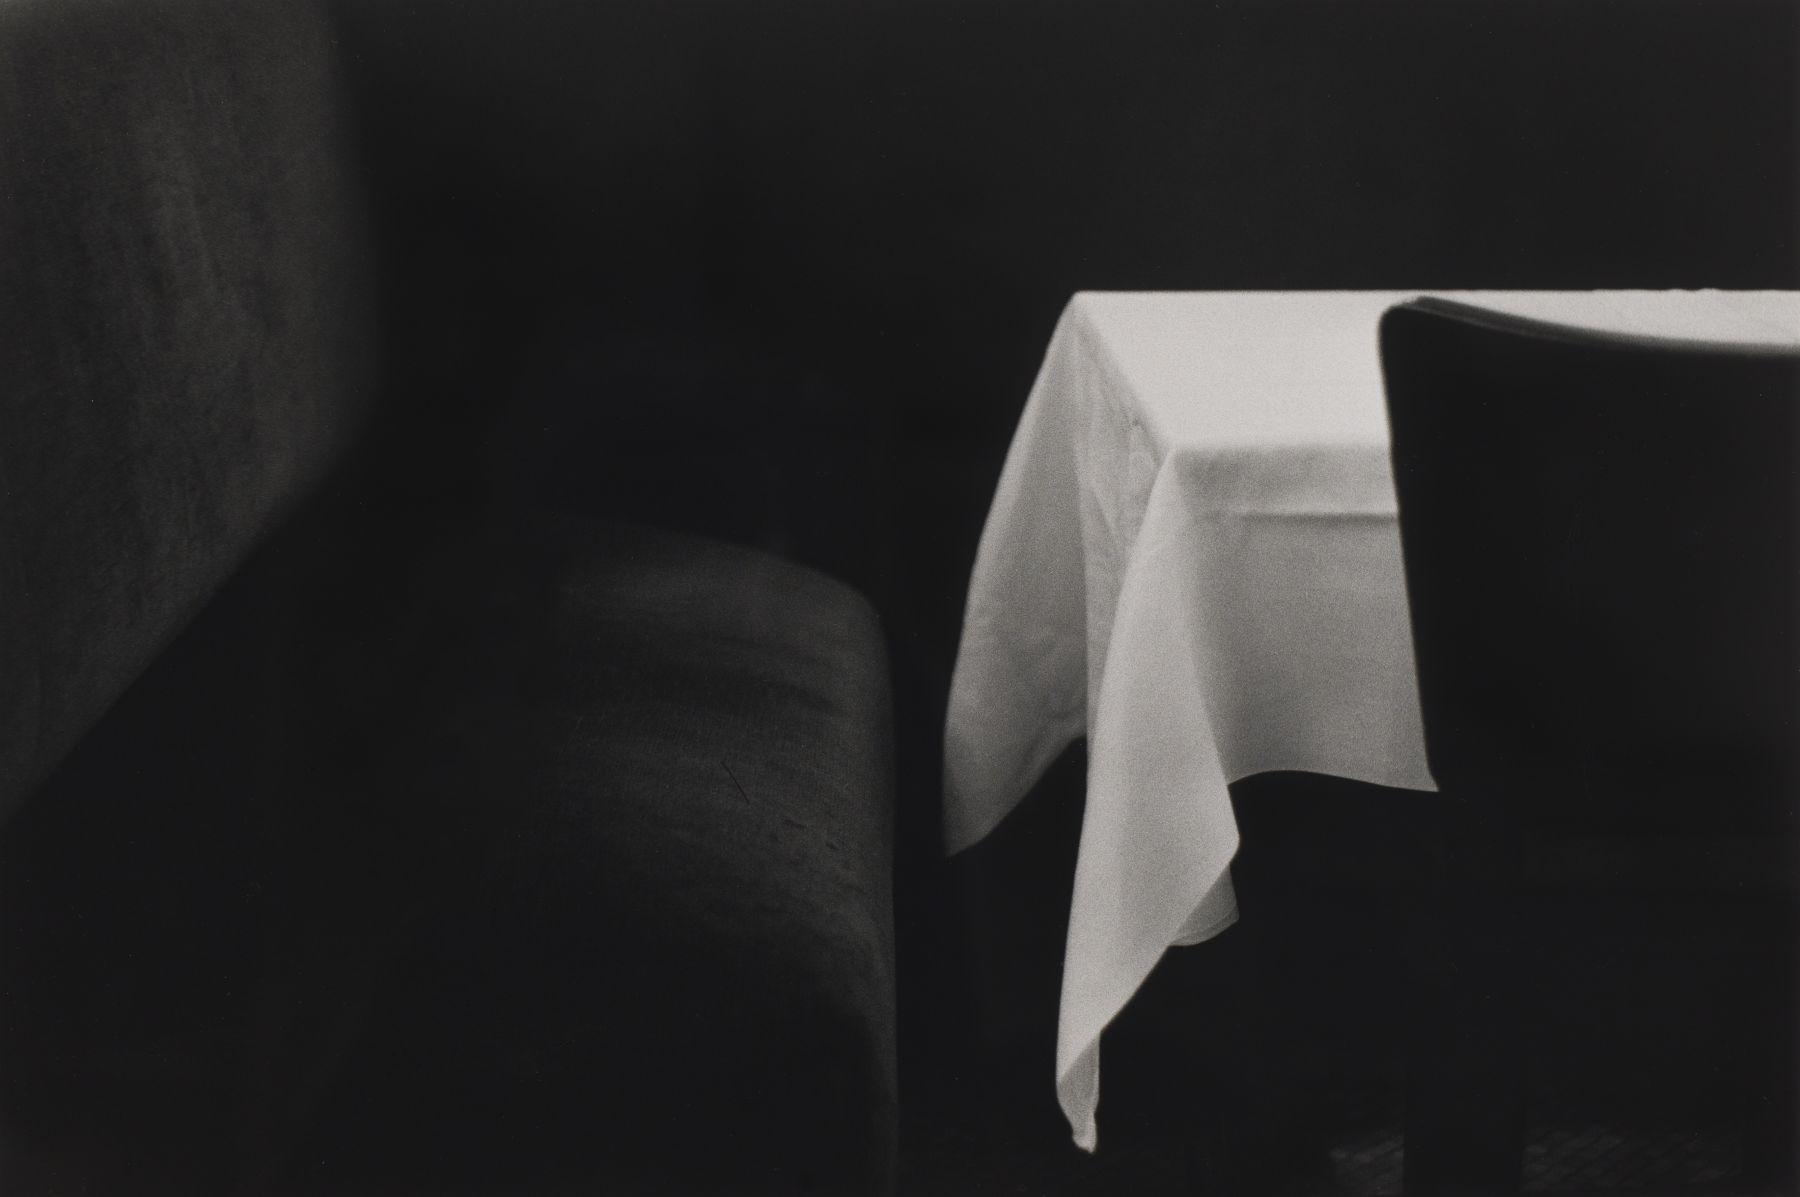 Bernard Plossu (1945-)  Paris, 1973  Gelatin silver print  12 x 16 inches (paper), black and white photography